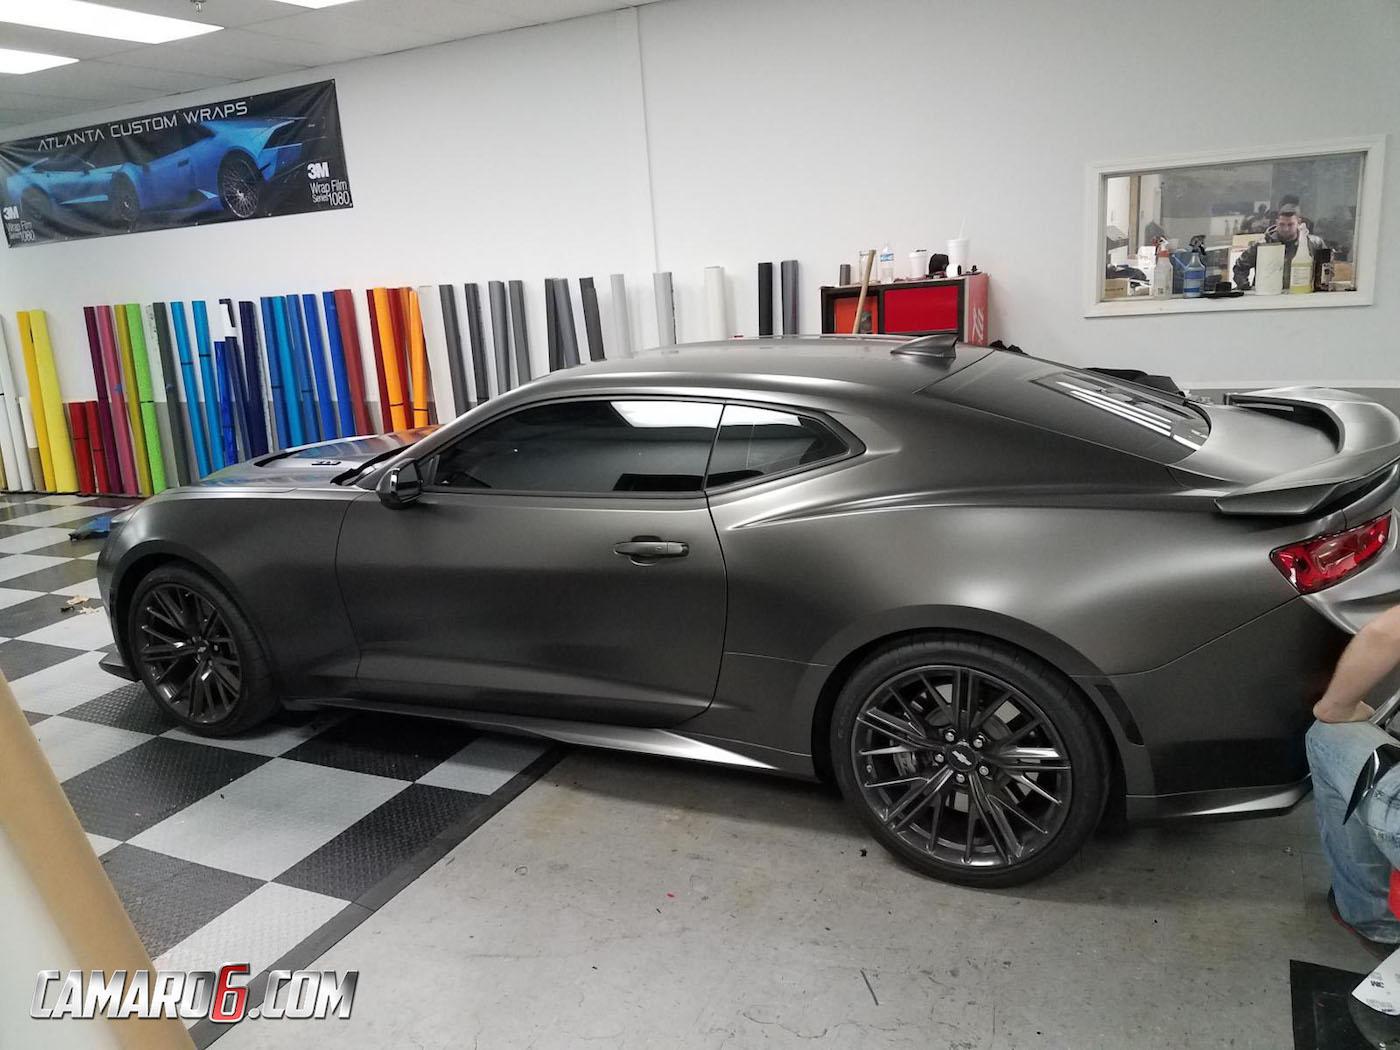 2017 Camaro Zl1 Gets Satin Nero Wrap Extreme Window Tint